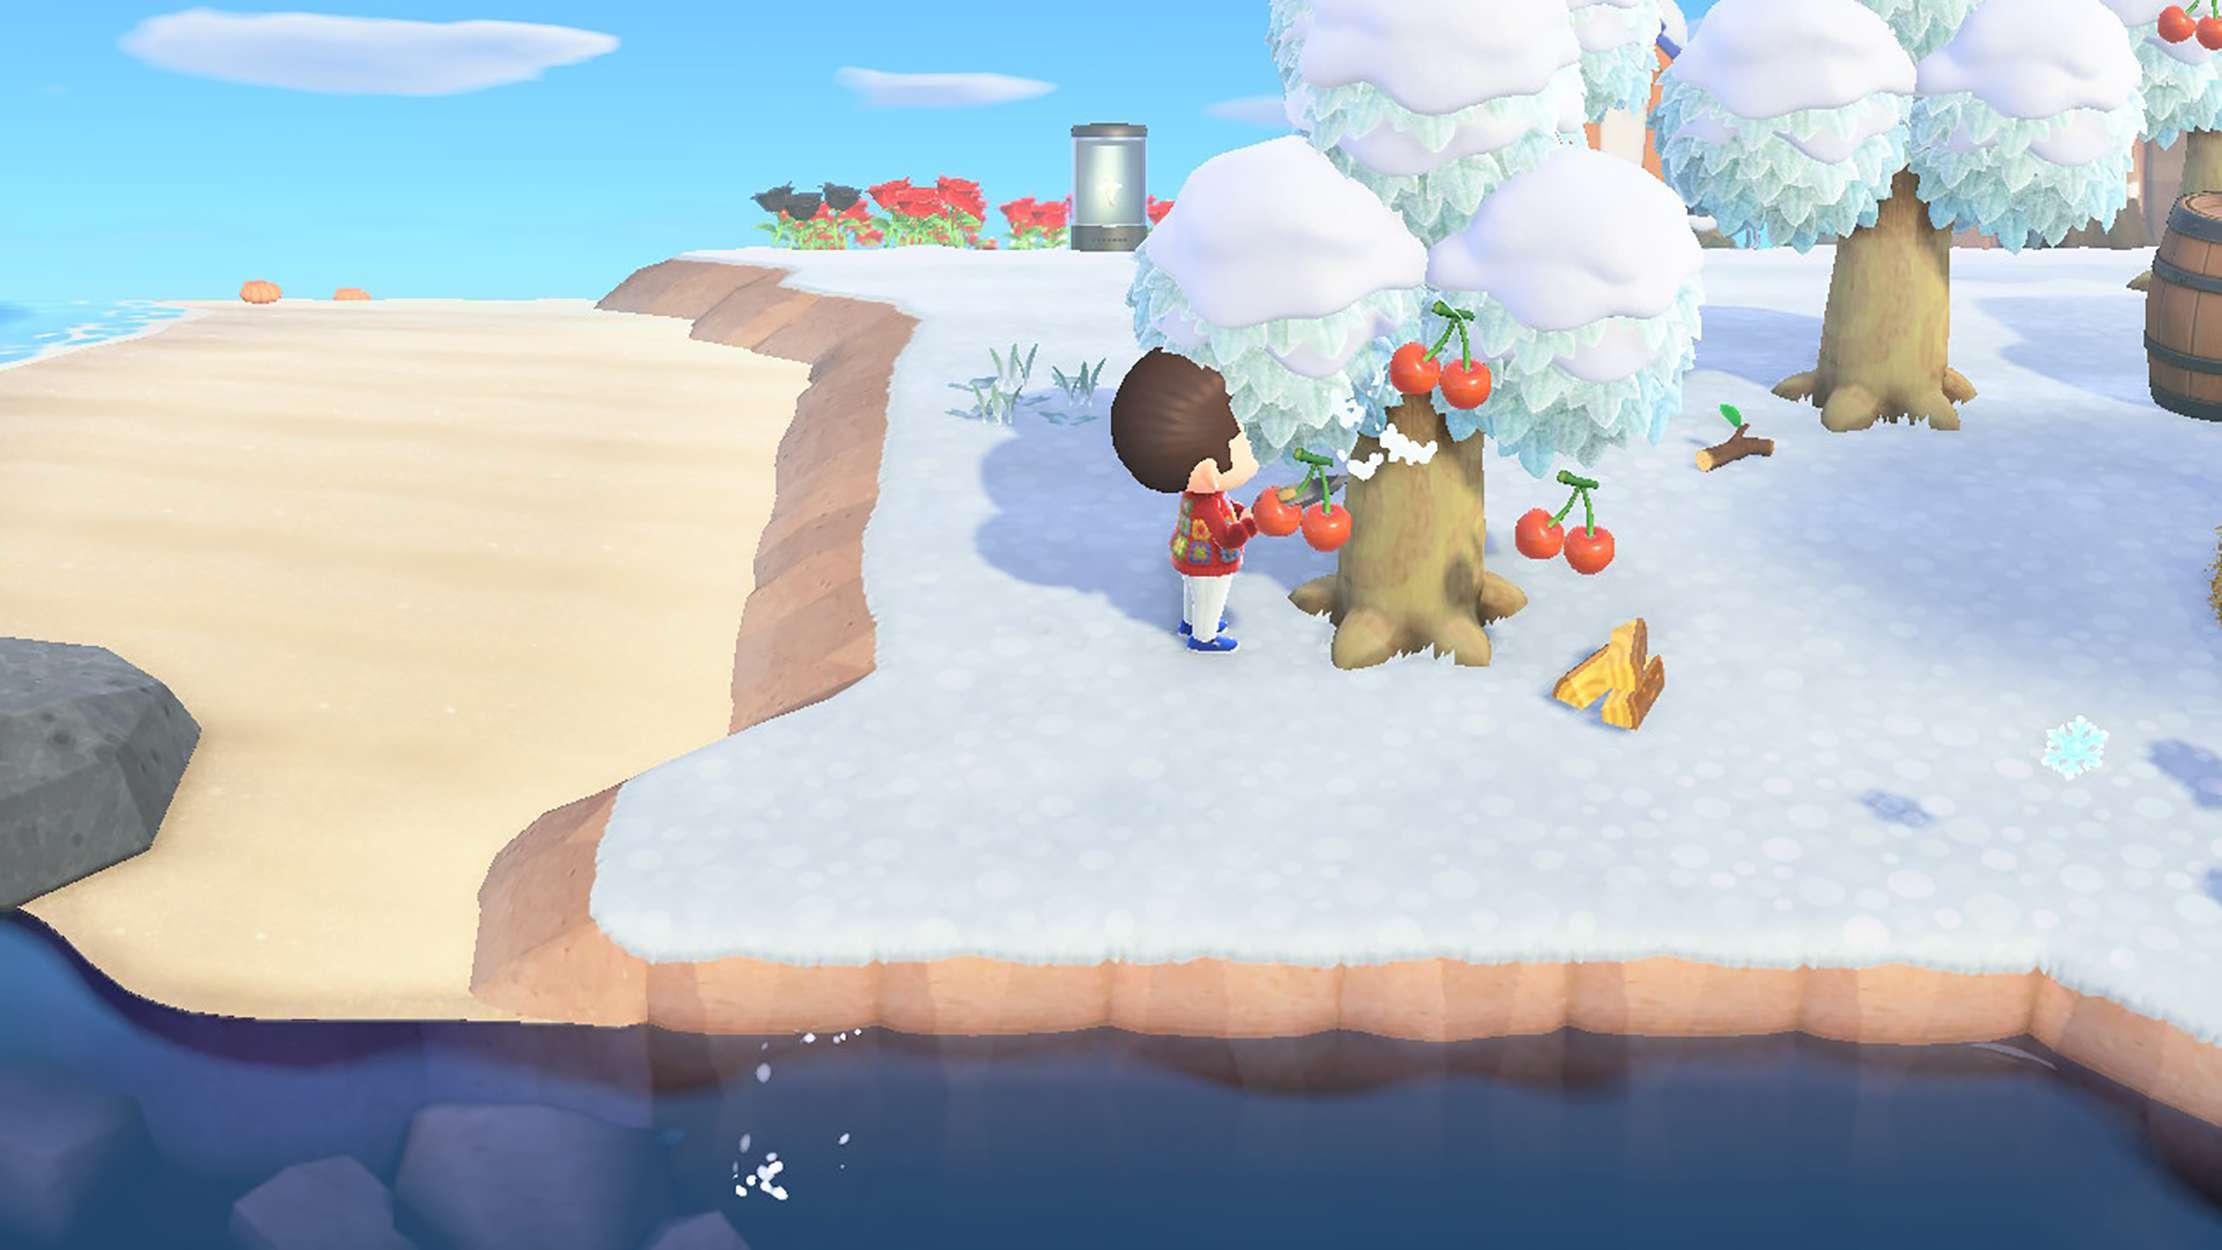 Screenshot of Animal Crossing New Horizons character chopping down a tree